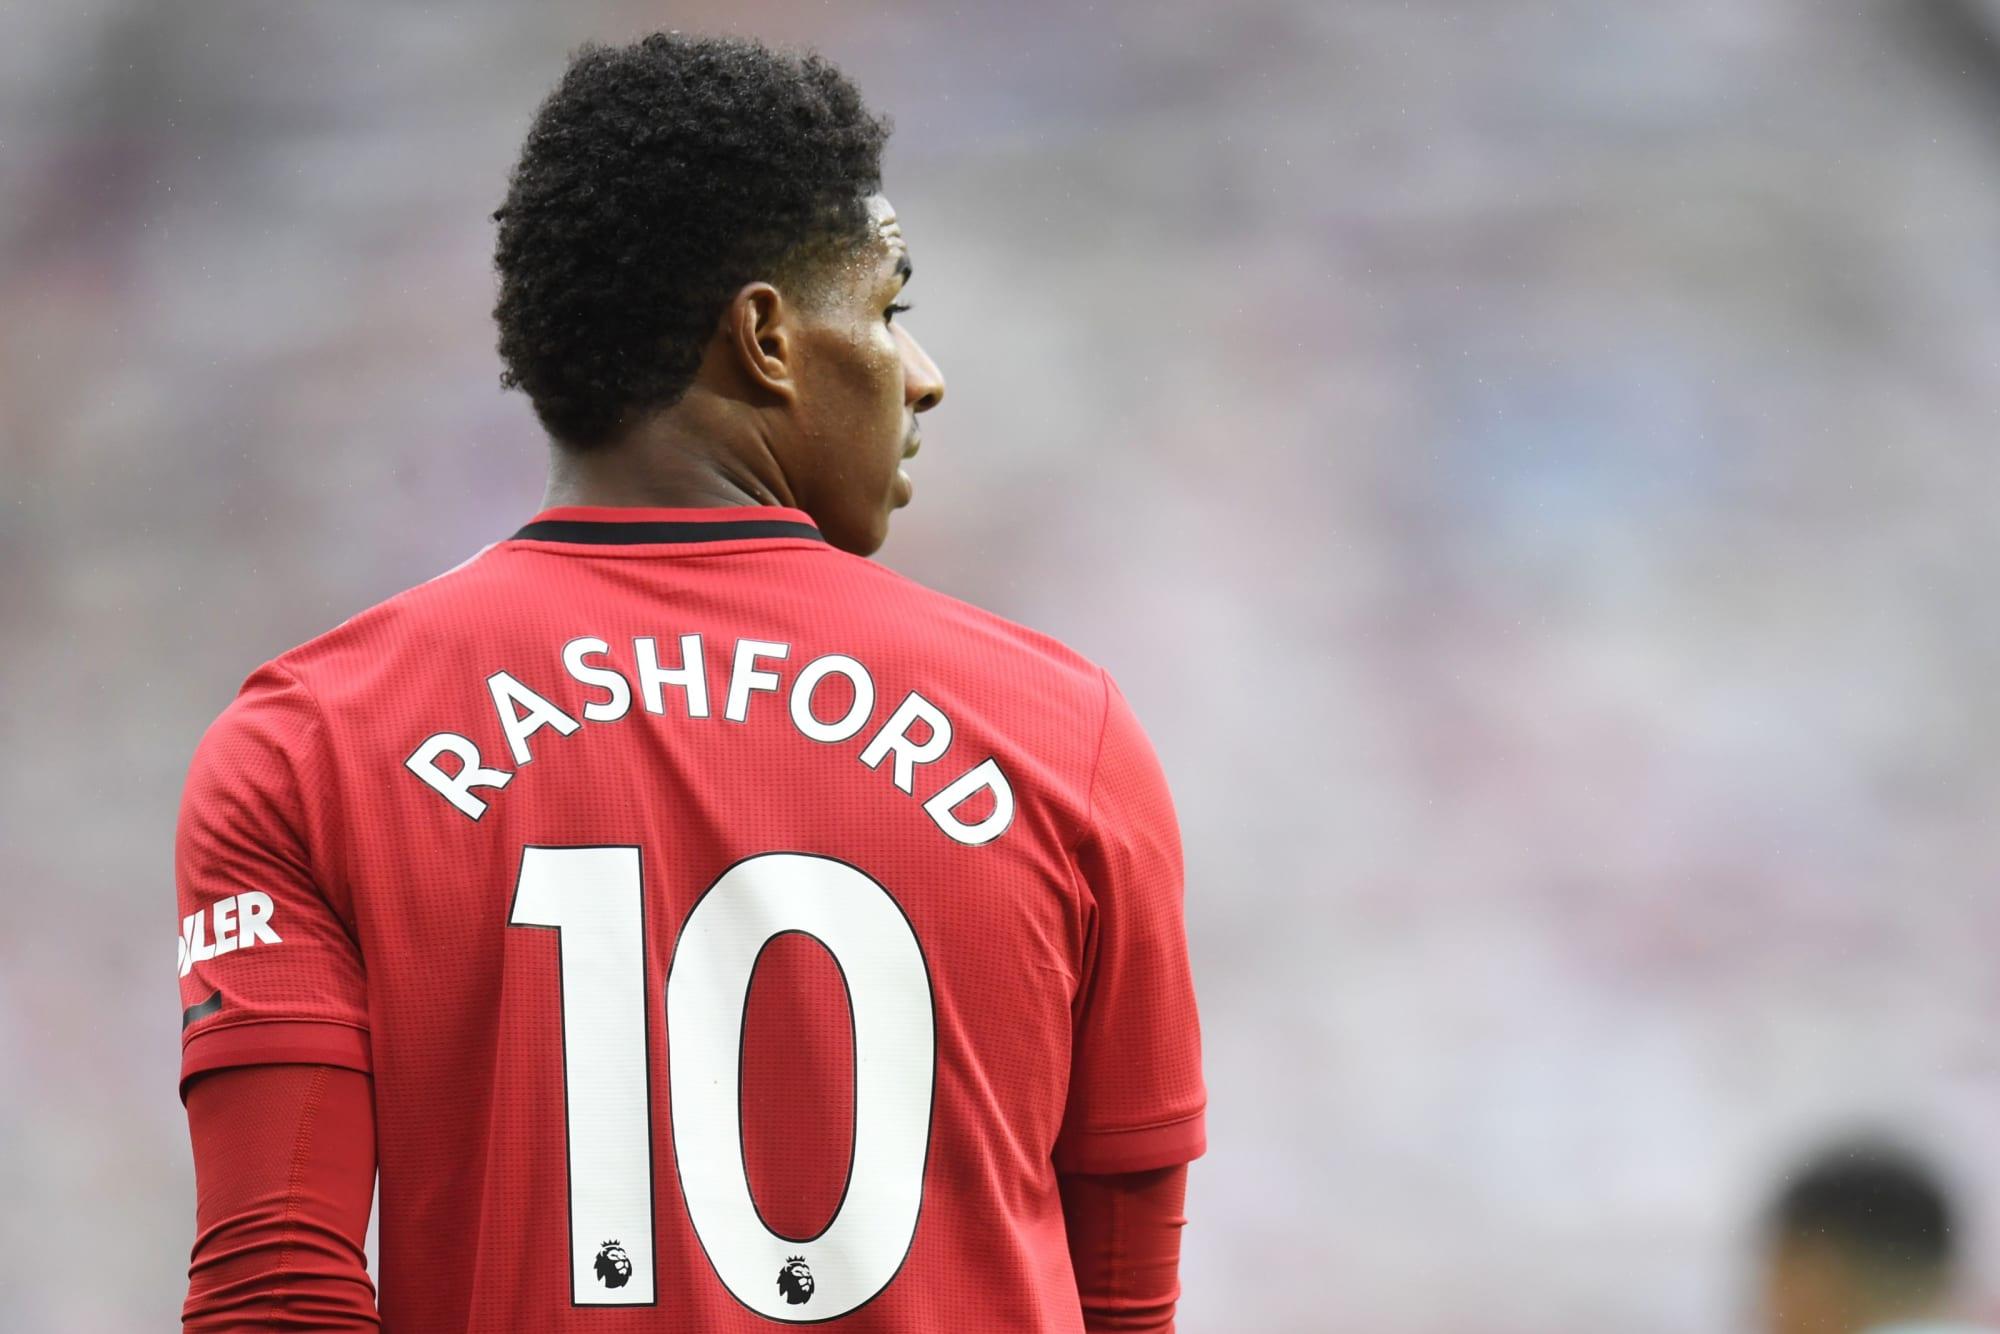 Manchester United won't entertain PSG's interest in Marcus Rashford